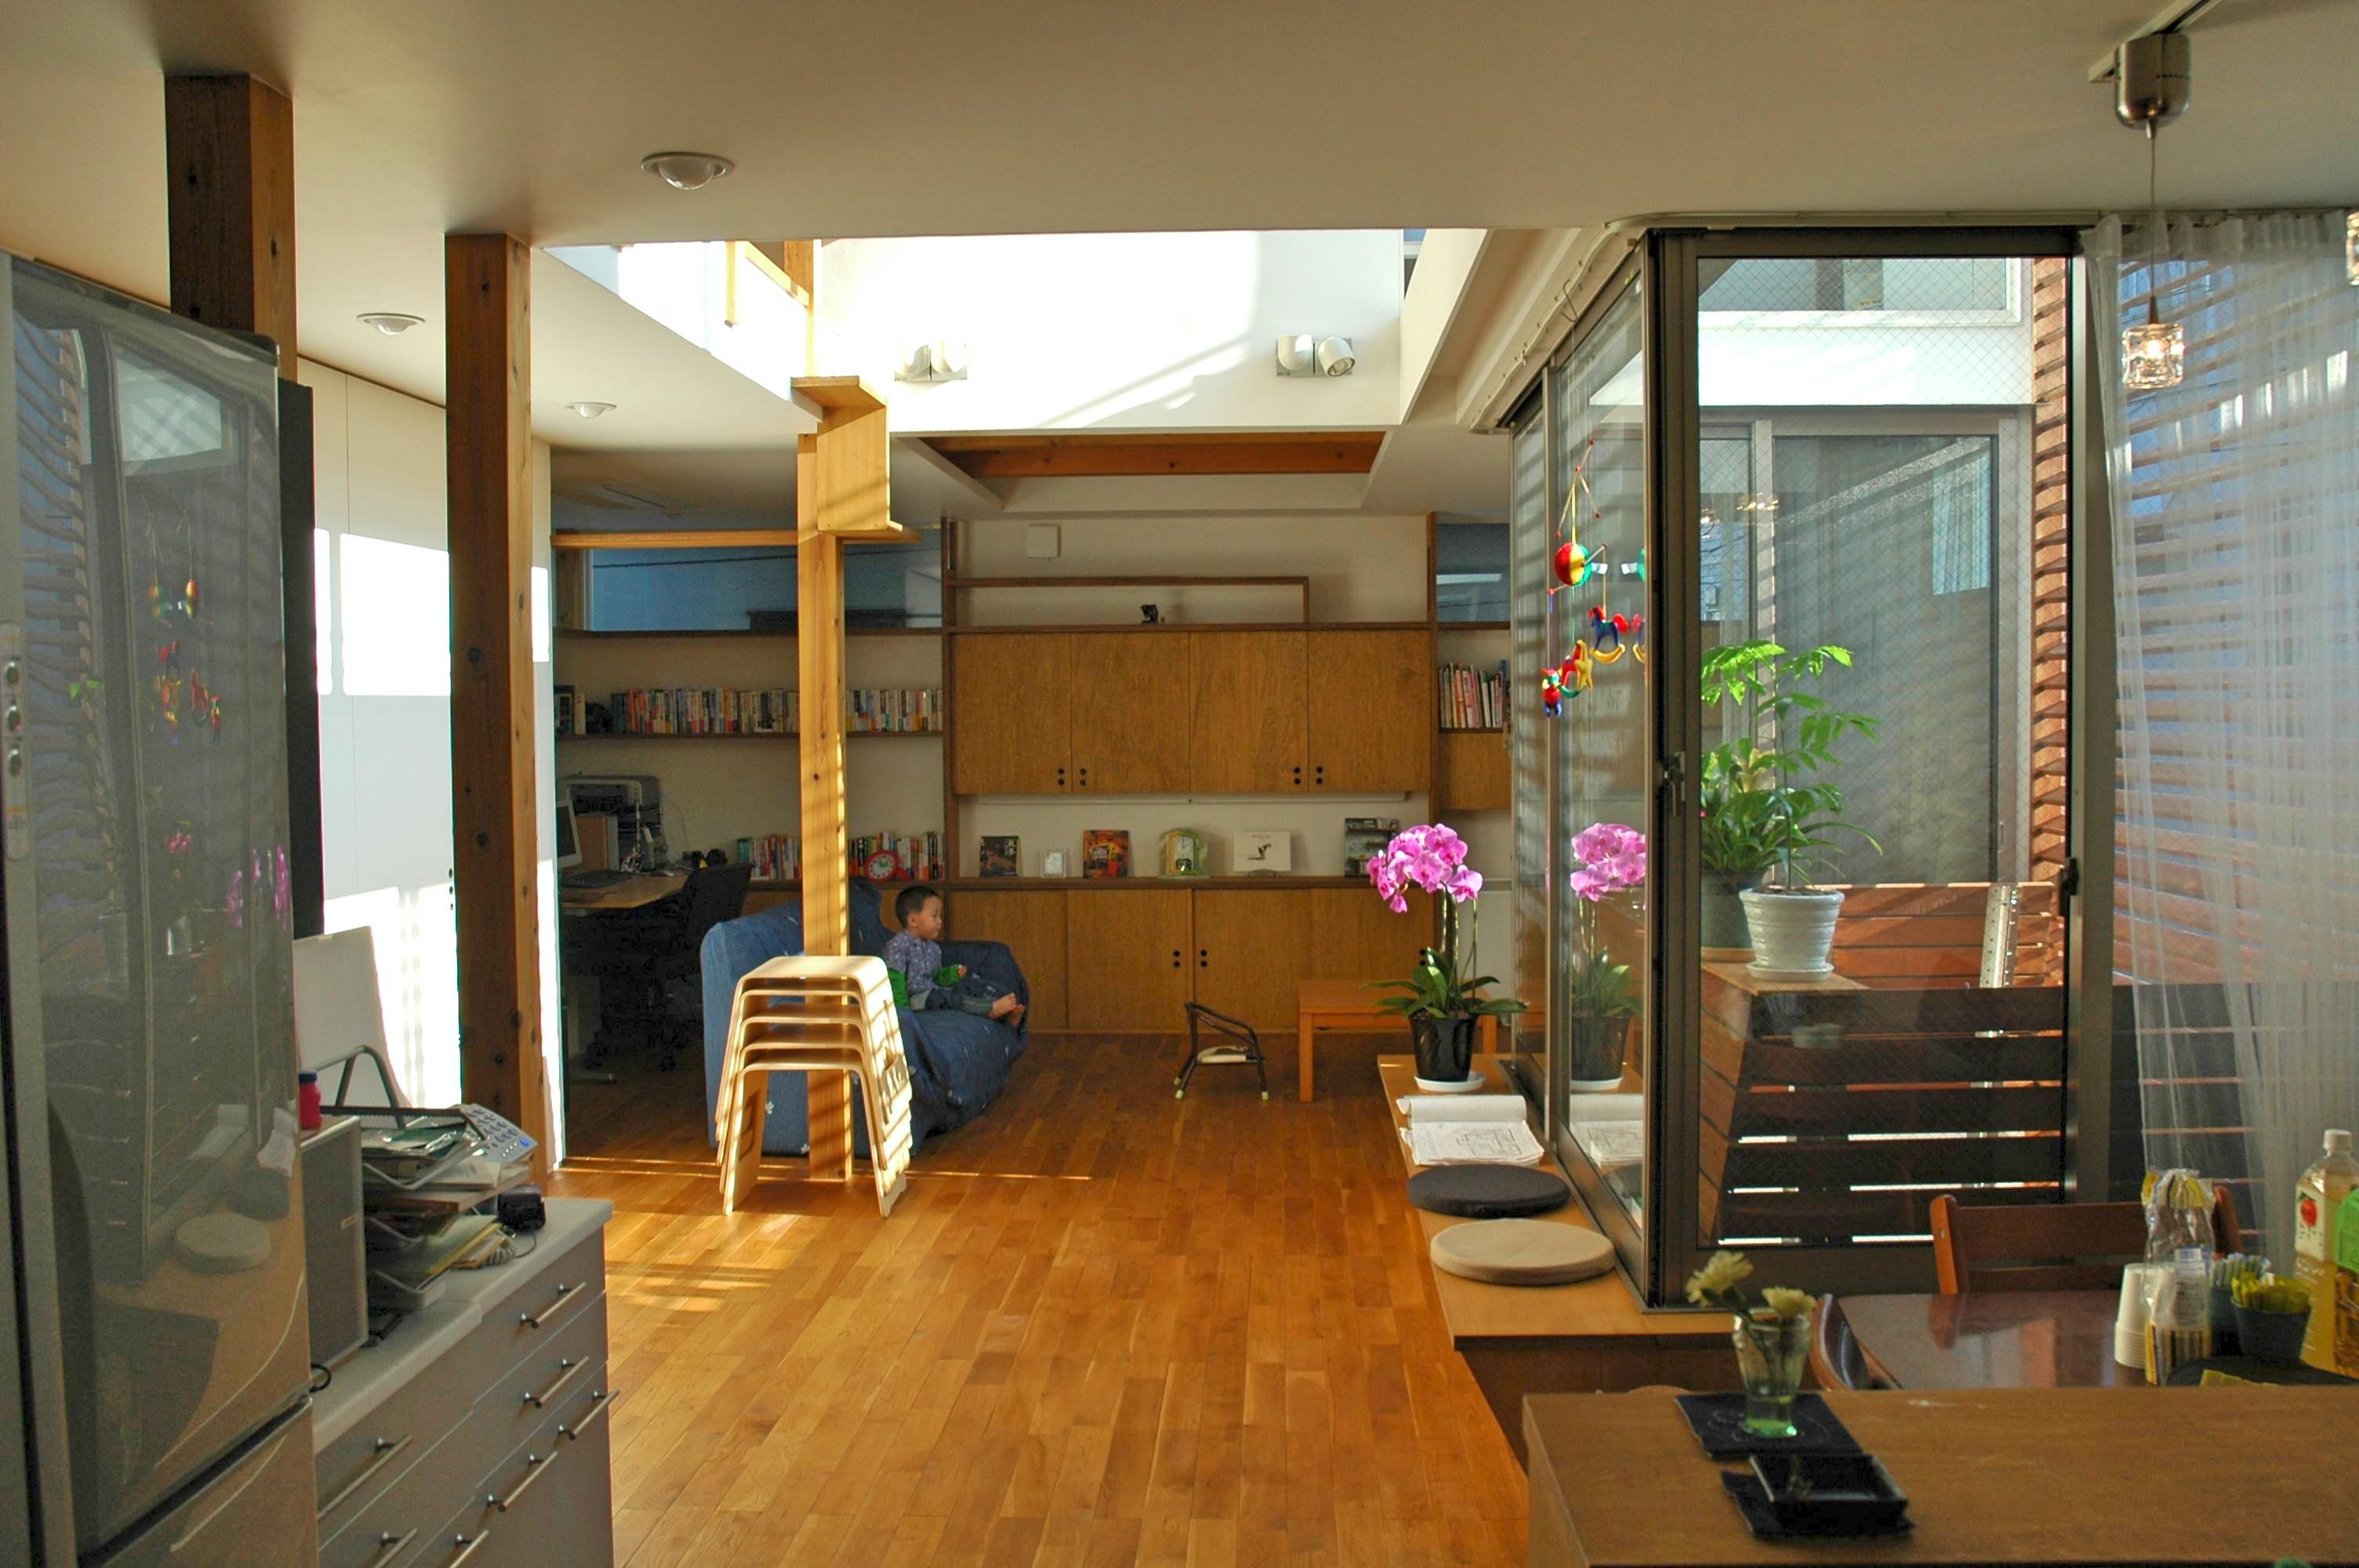 HOUSE OF HIDAMARI